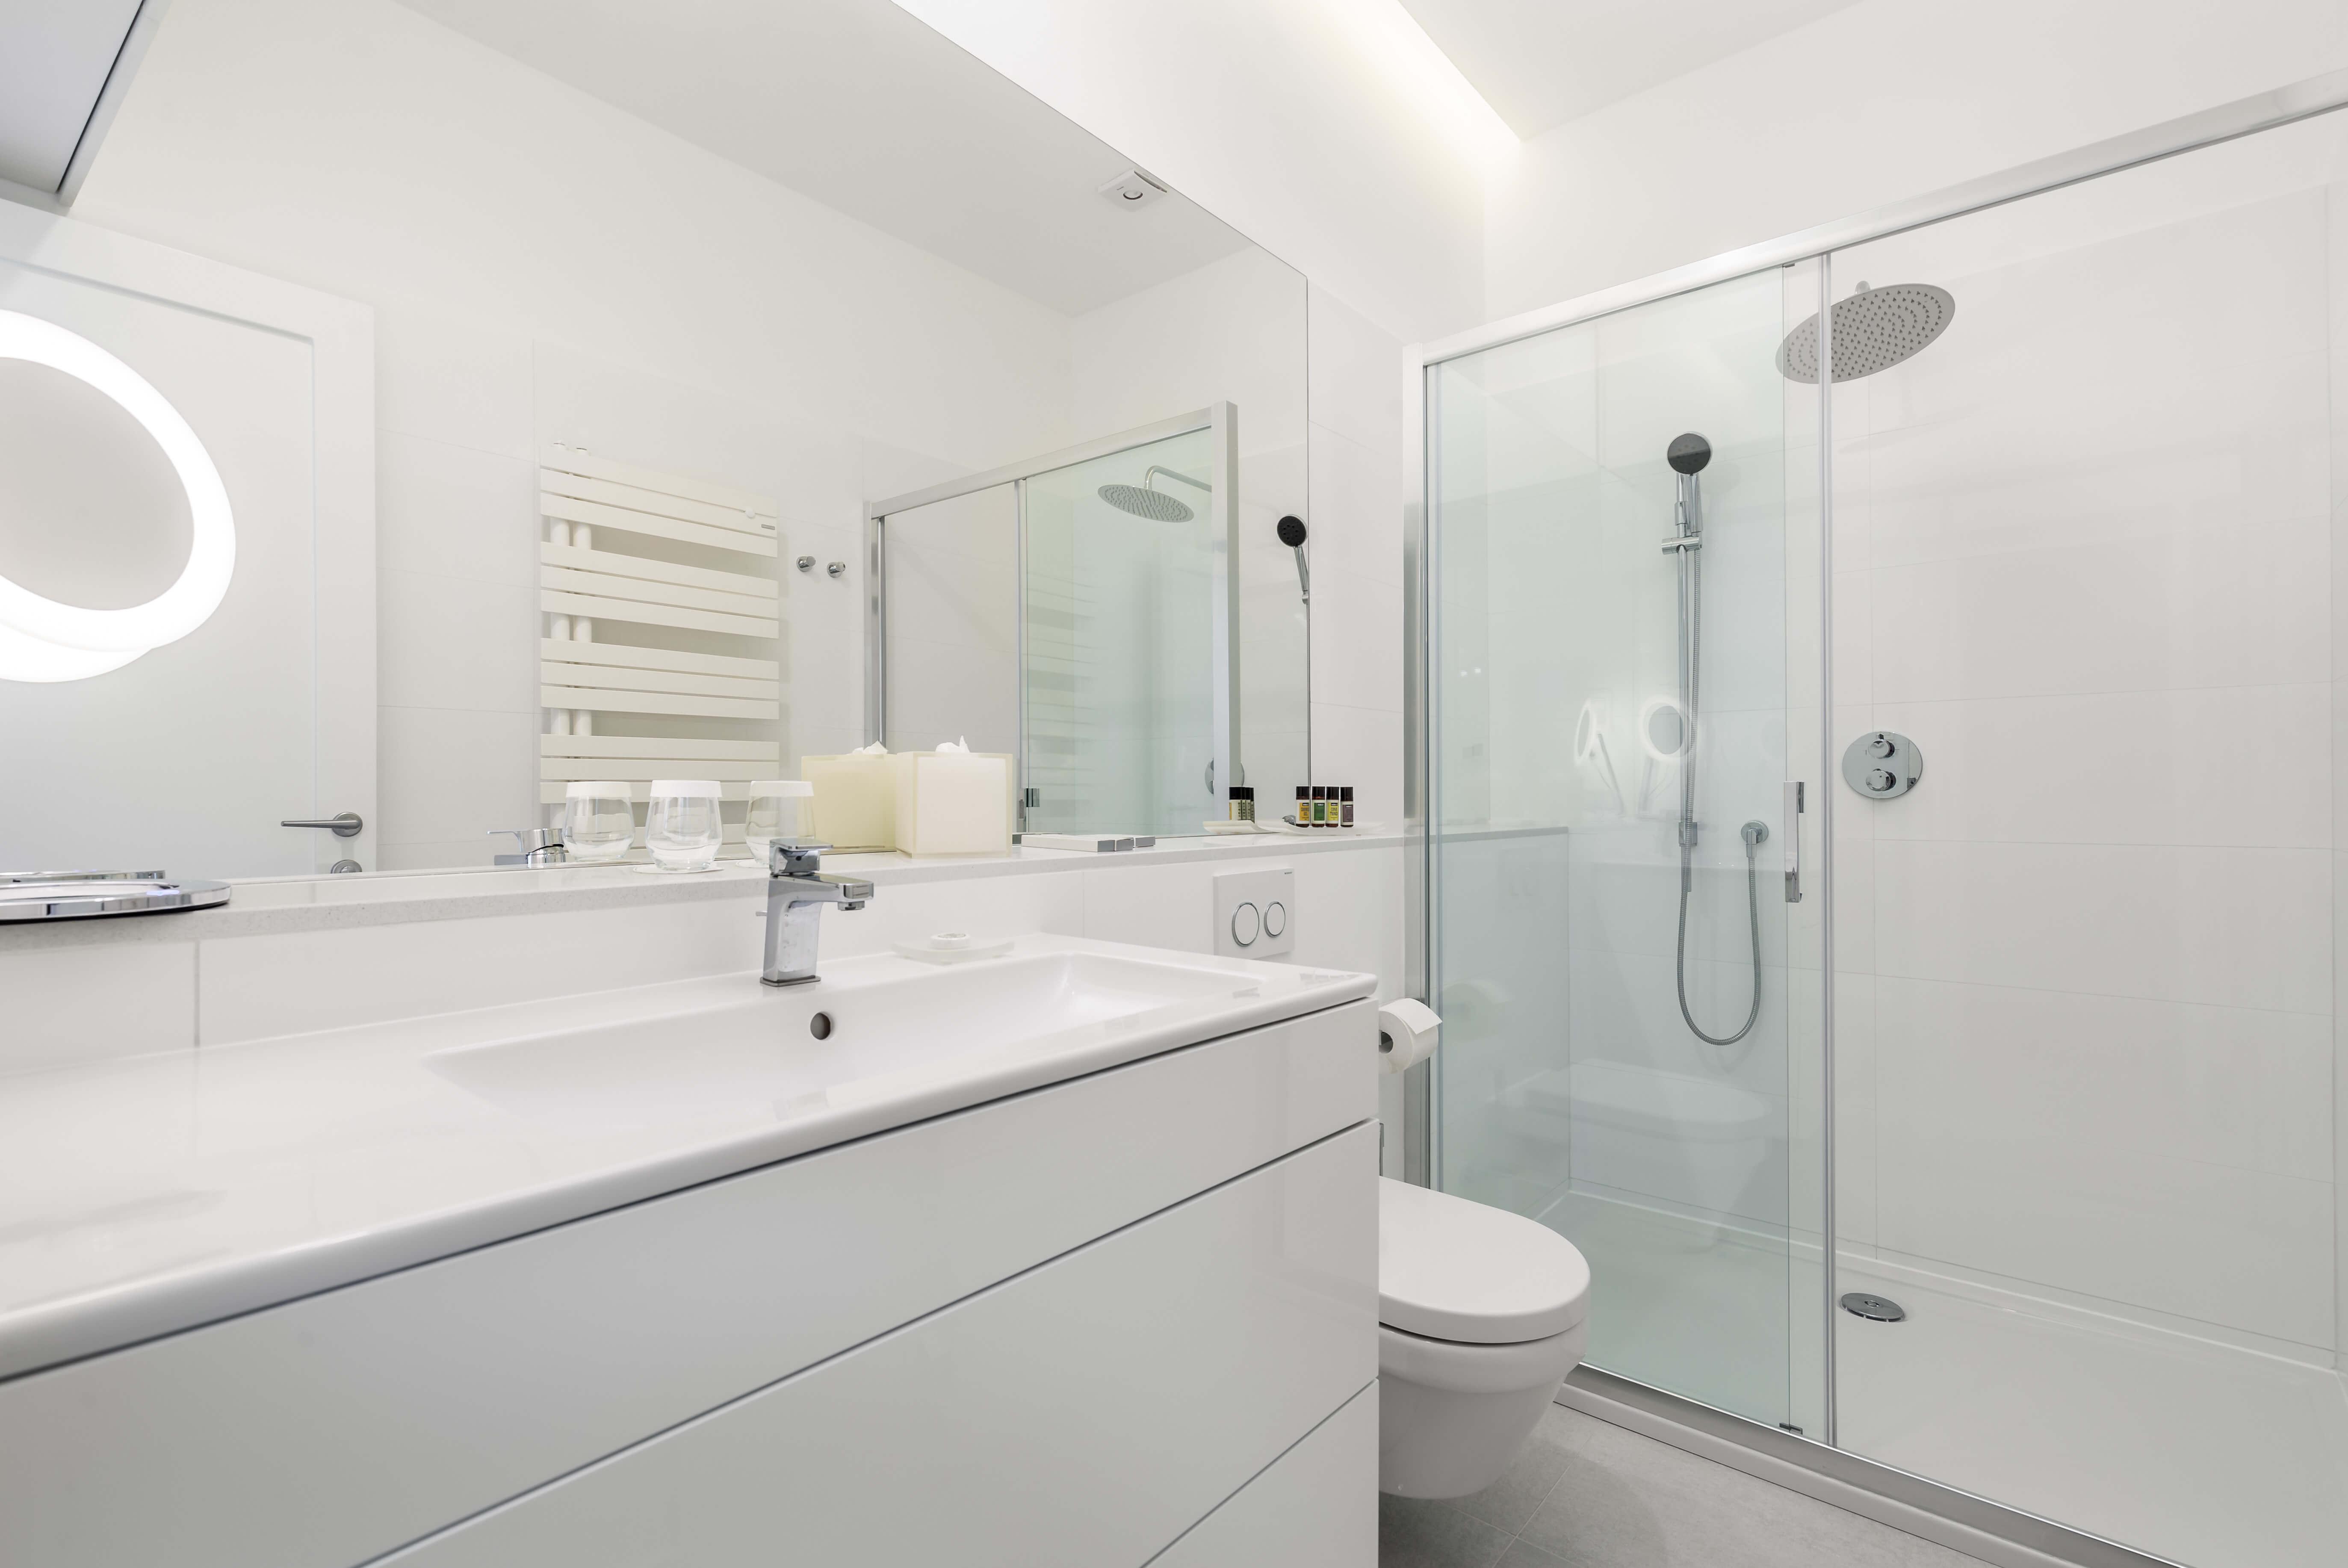 kupaonica, apartman OLA; opatija, kvarner, hrvatska, bijela kupaonica, luksuzna kupaonica